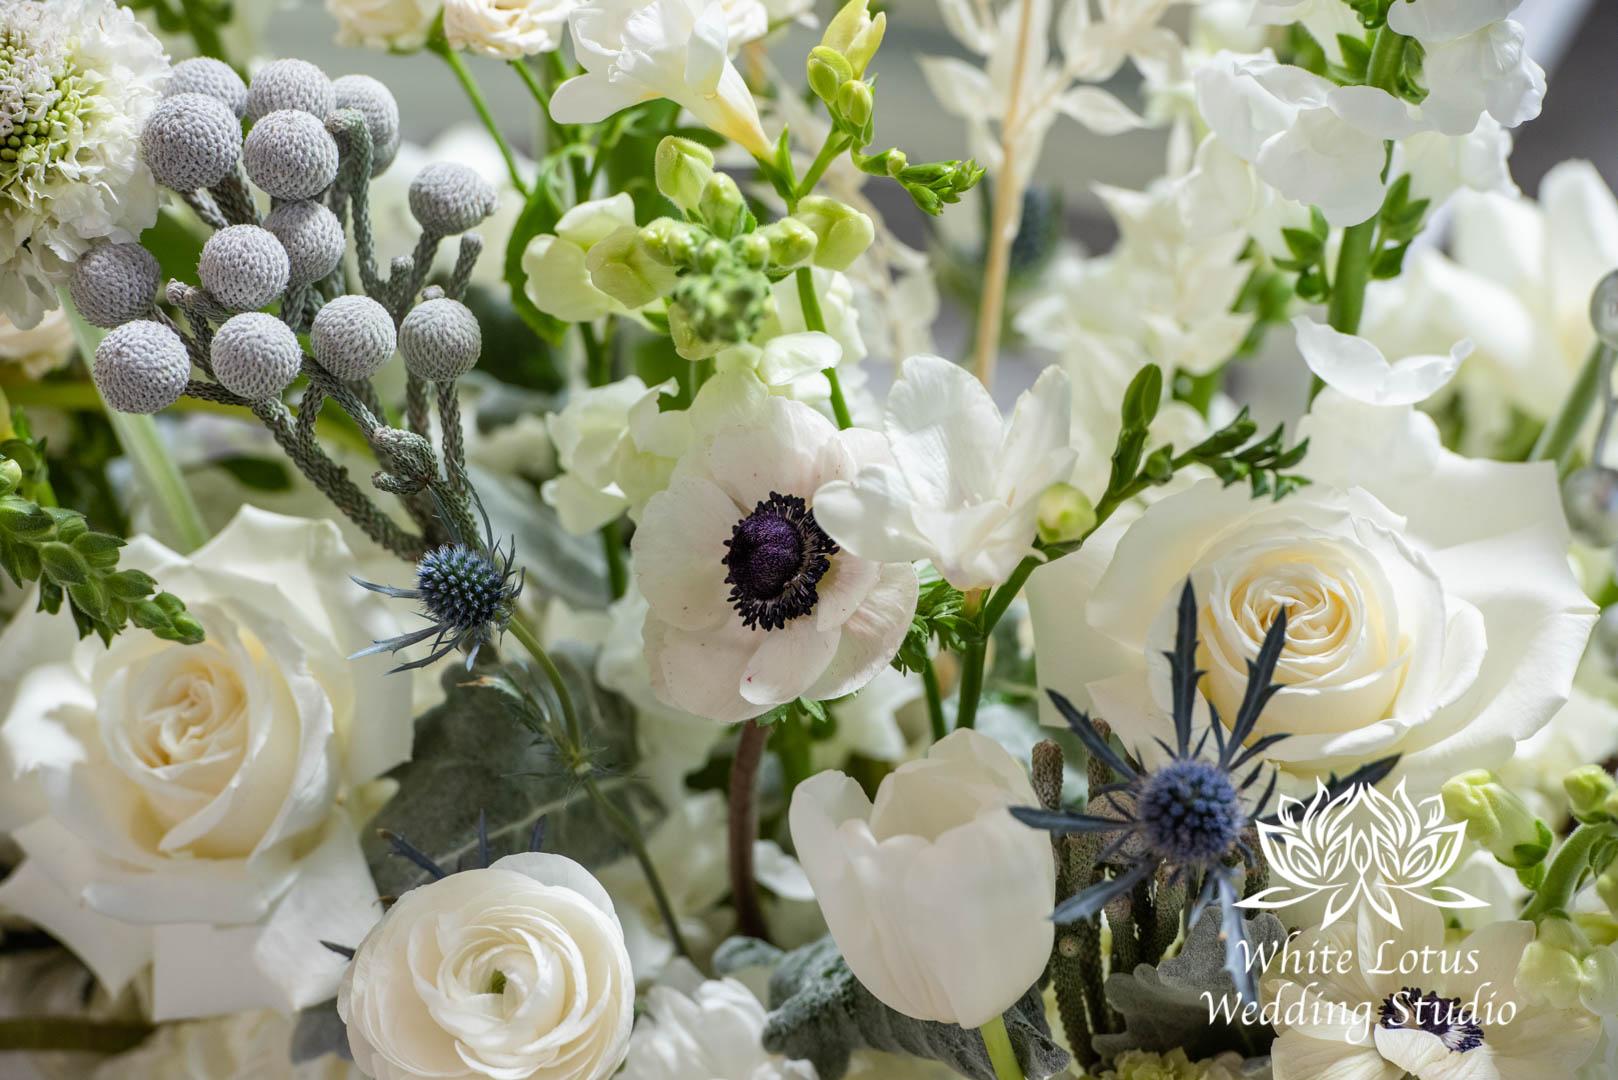 033- GLAM WINTERLUXE WEDDING INSPIRATION